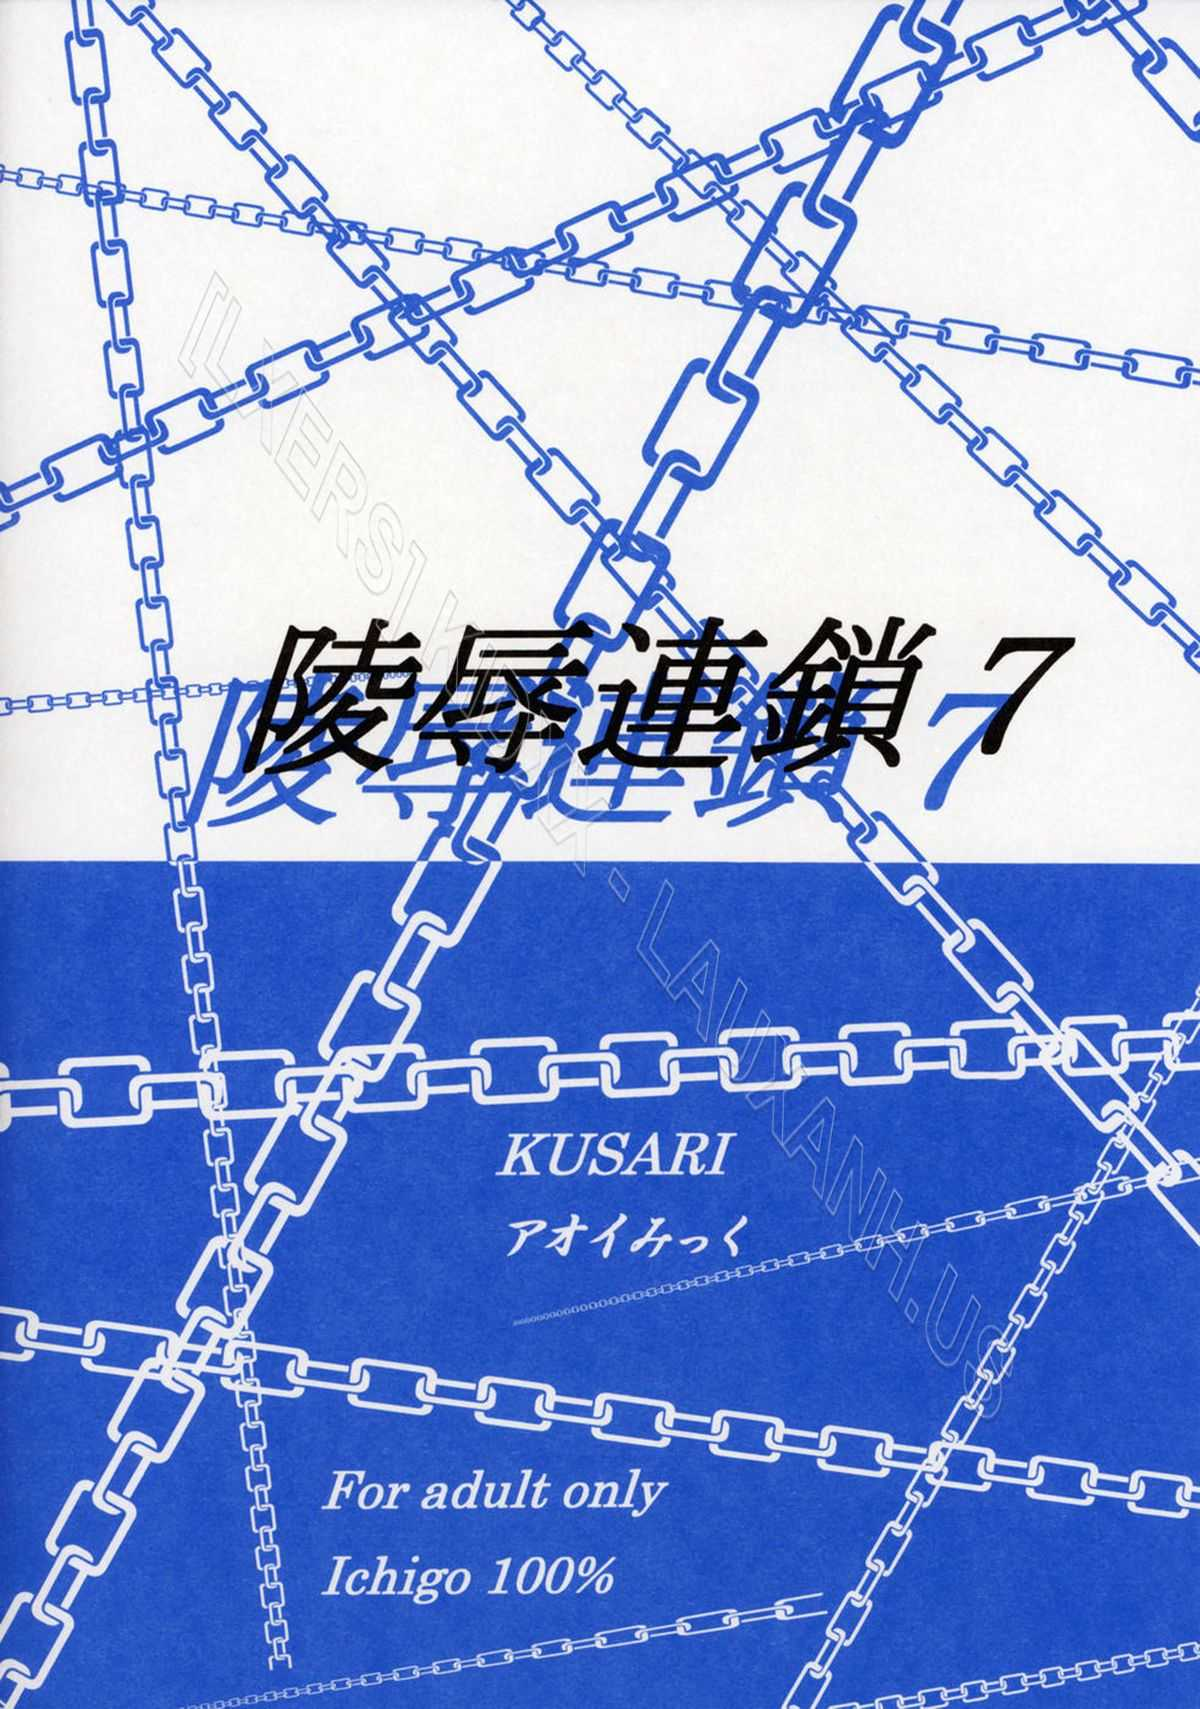 TruyenHay.Com - Ảnh 20 - Ryoujoku Rensa Chapter 7